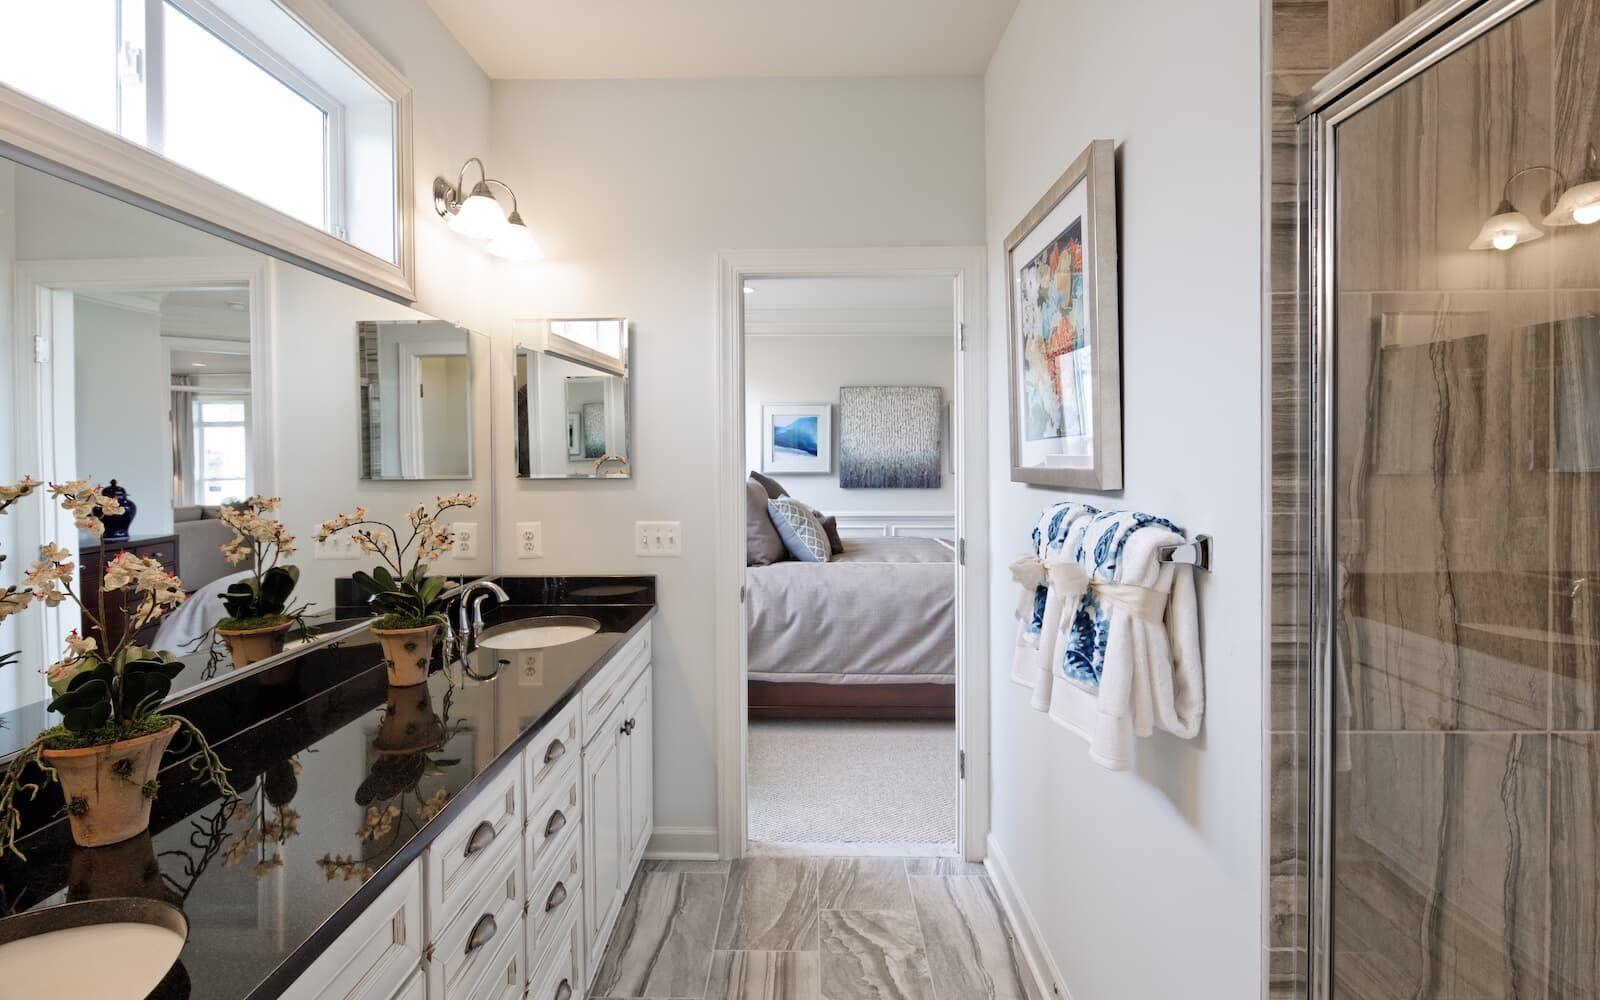 Bathroom featured in the Bridgeport II By Brookfield Residential in Eastern Shore, MD